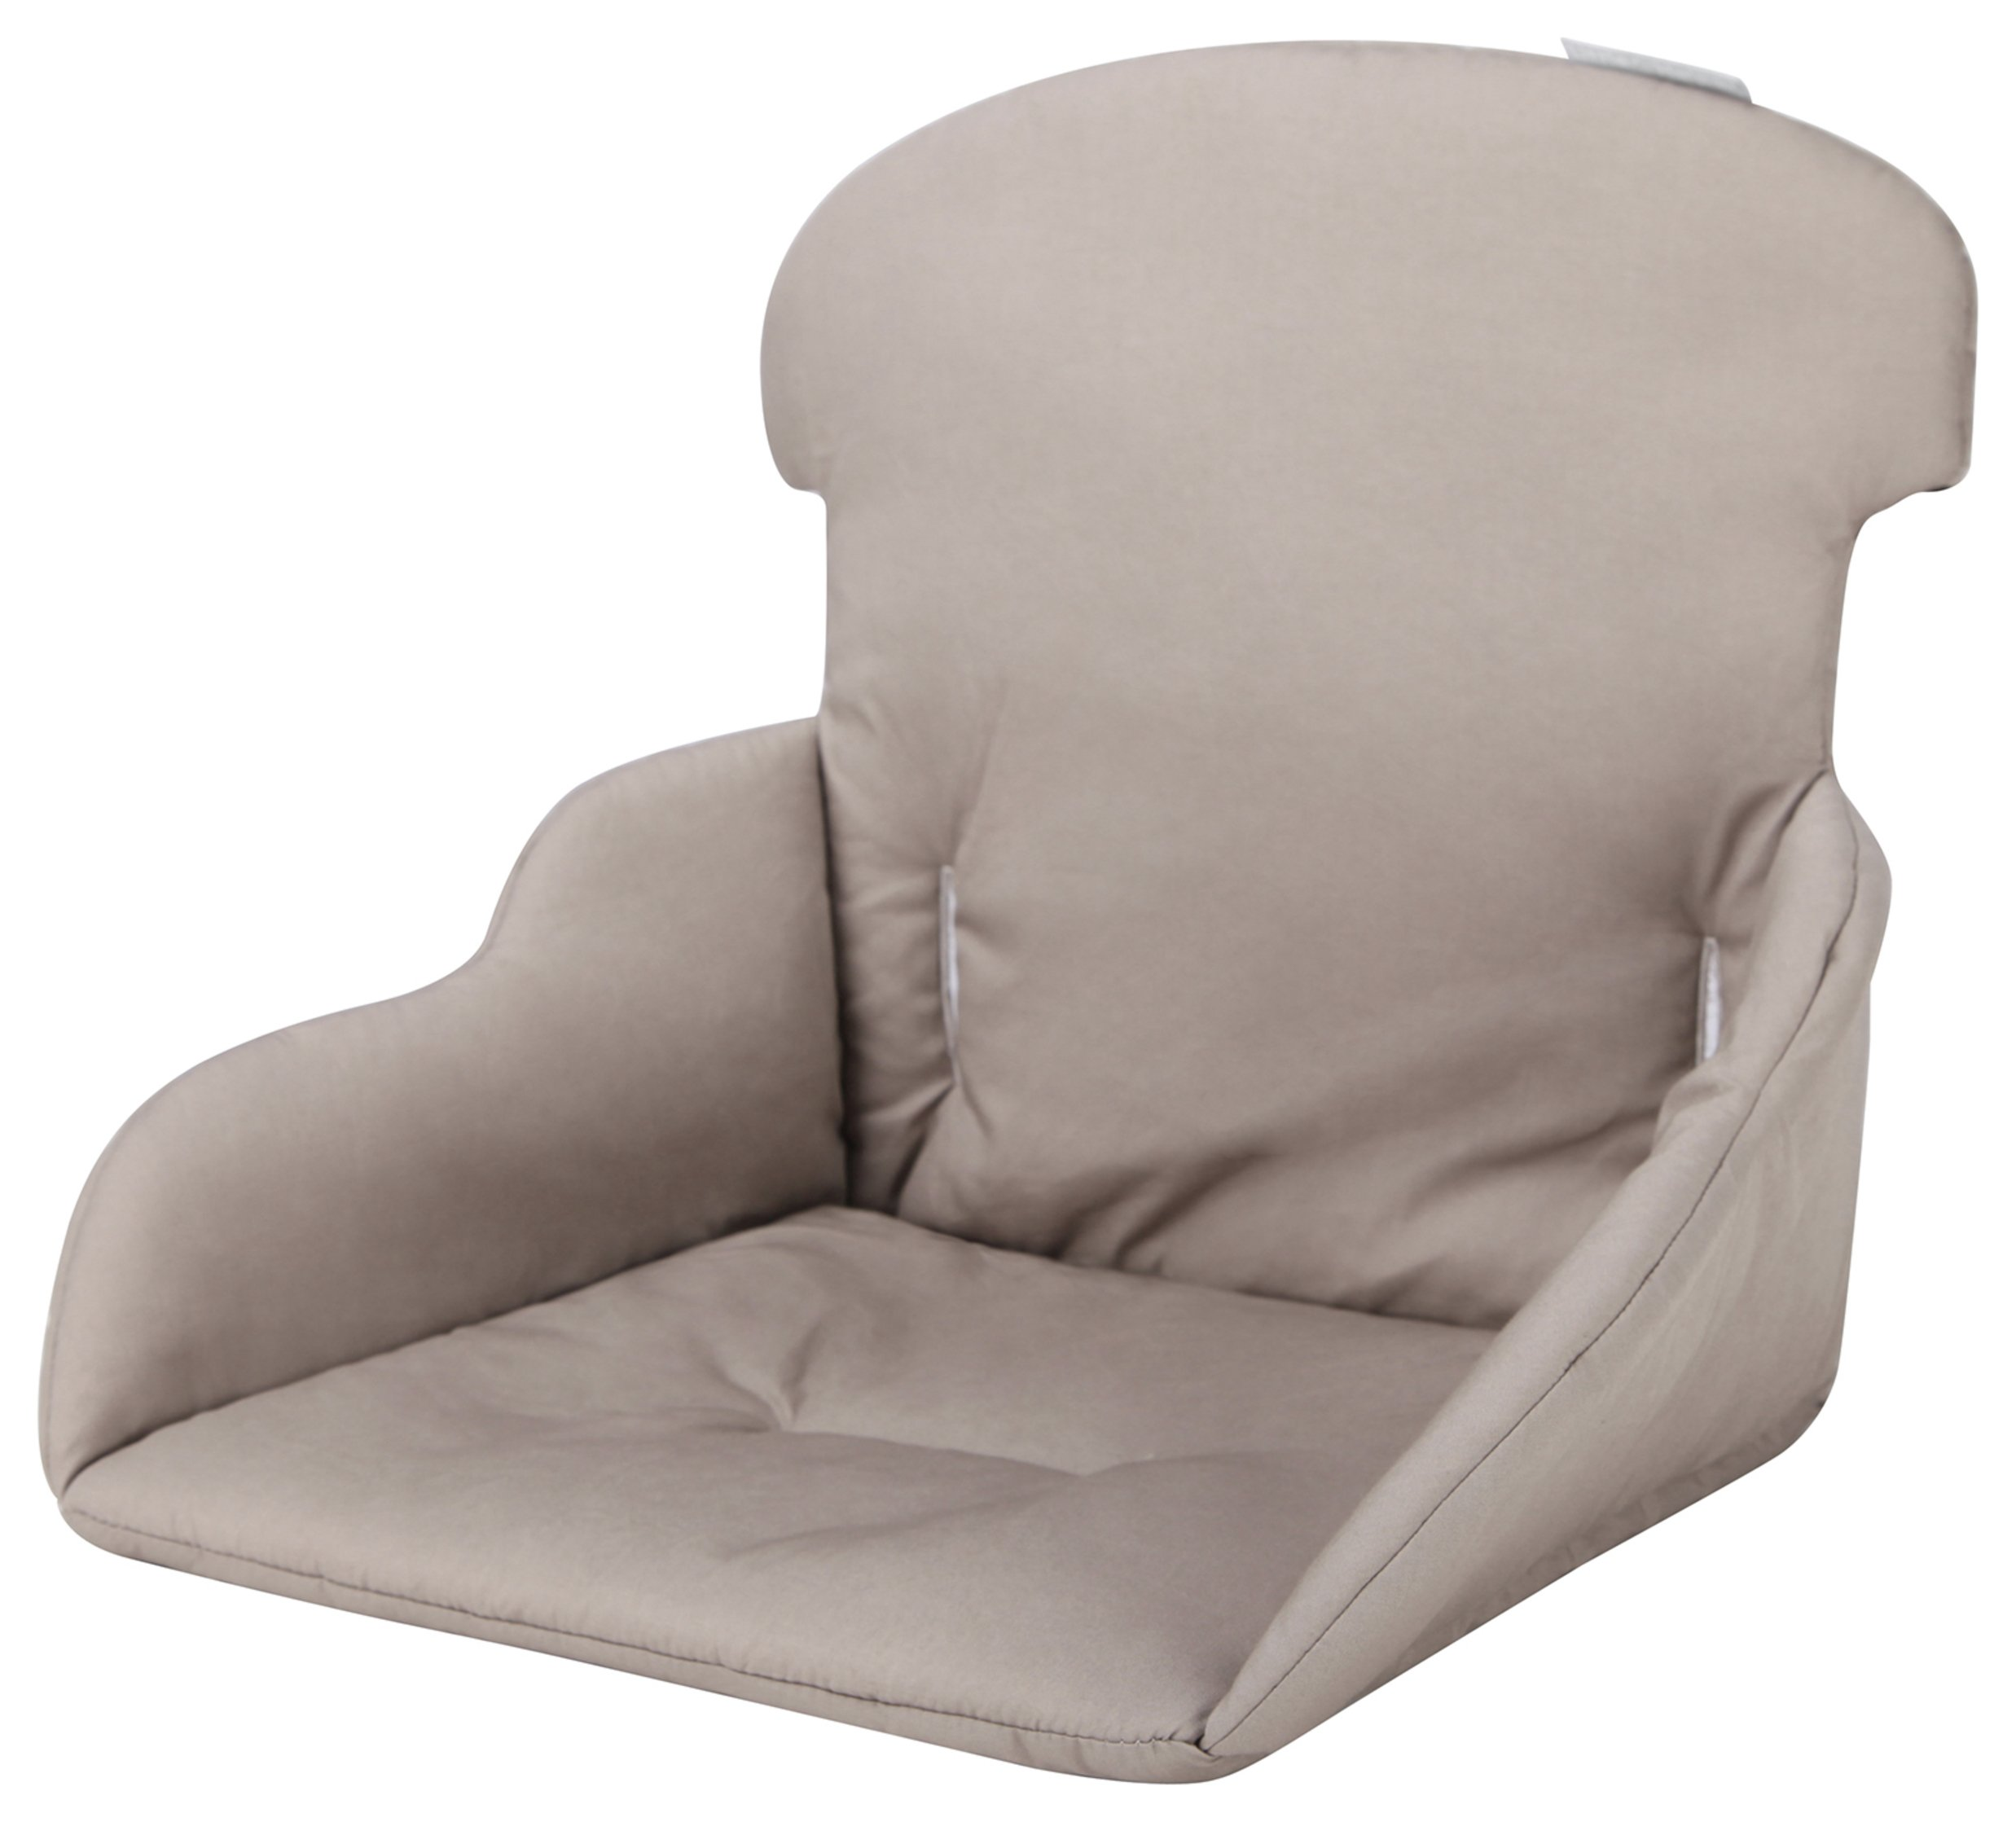 Image of Little Helper FunPod High Chair Cushion - Caramel